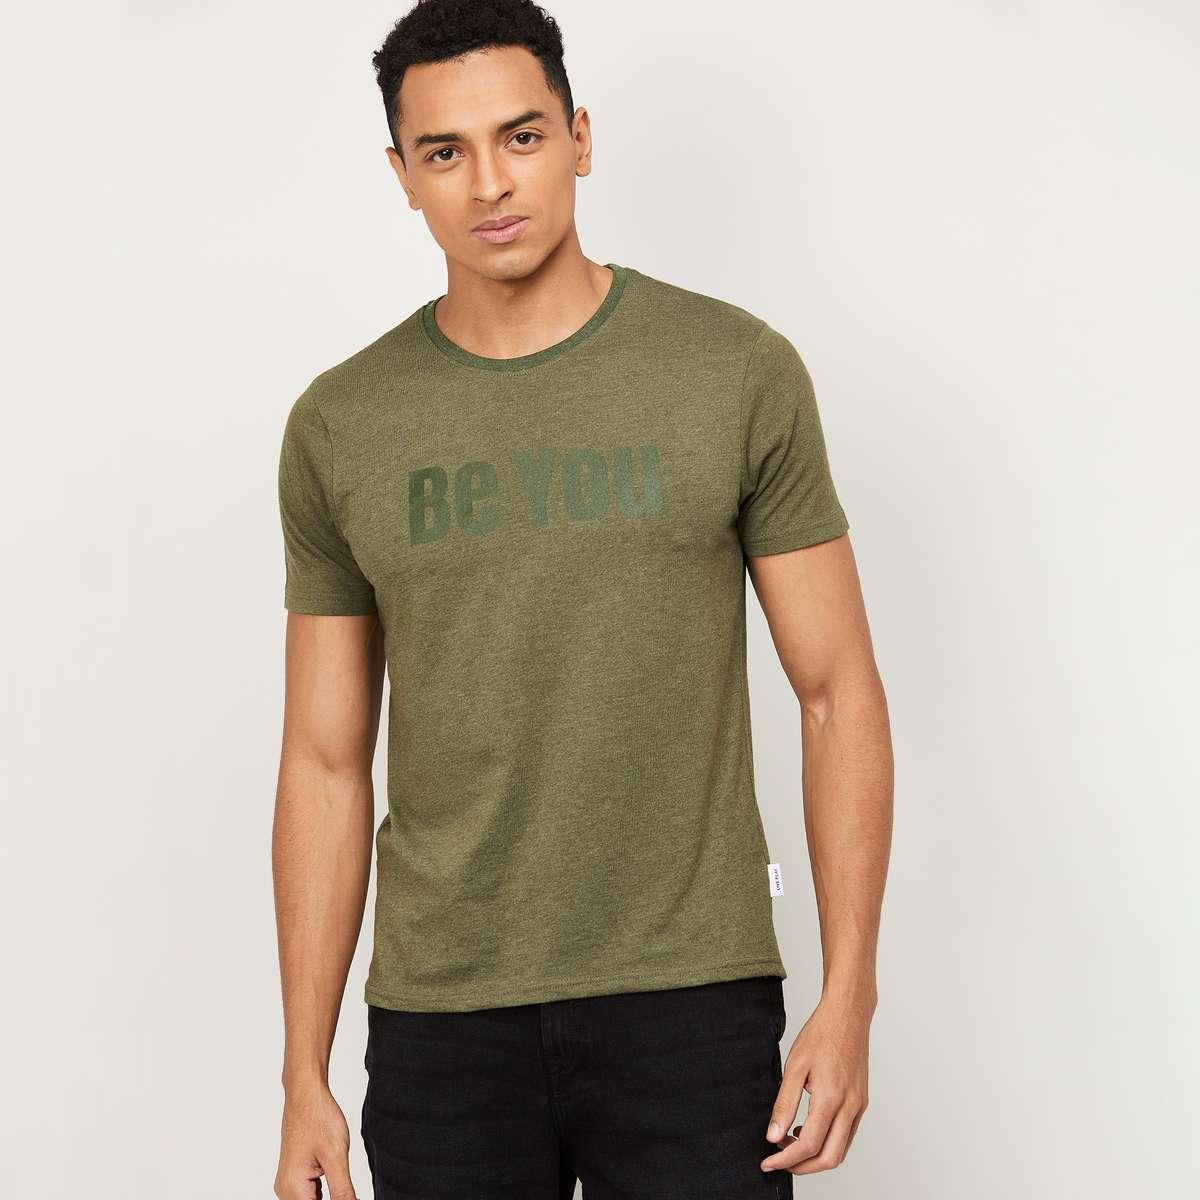 2.FAME FOREVER Men Printed Crew Neck T-Shirt